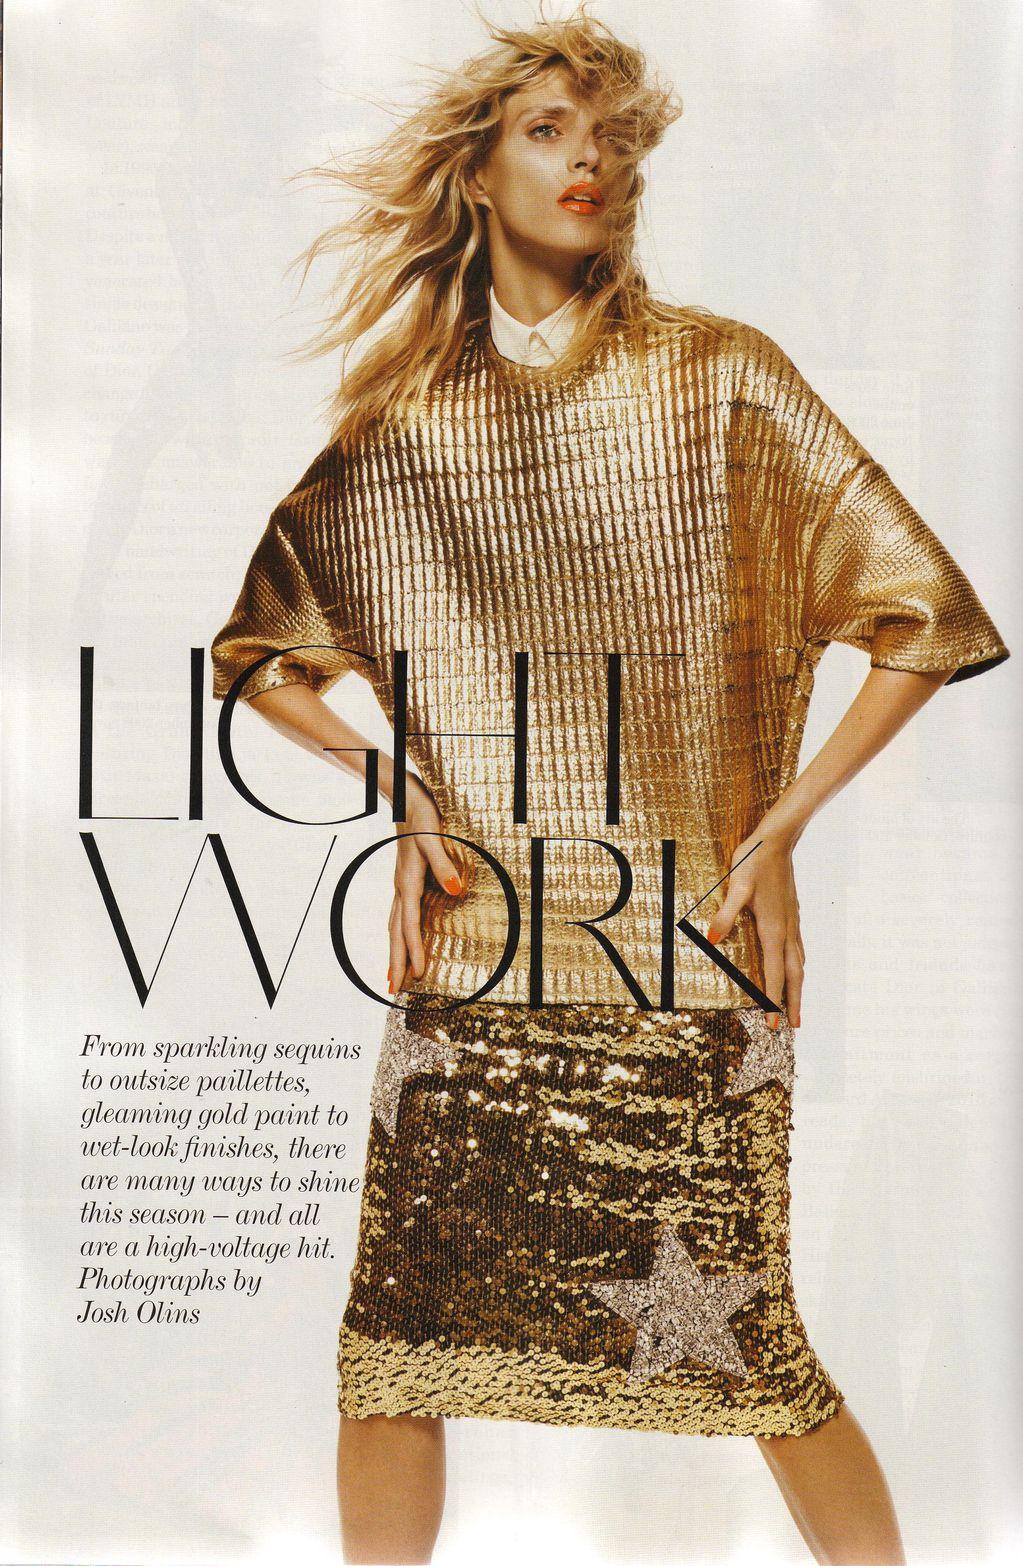 Anja Rubik by Josh Olins for Vogue UK September 2011